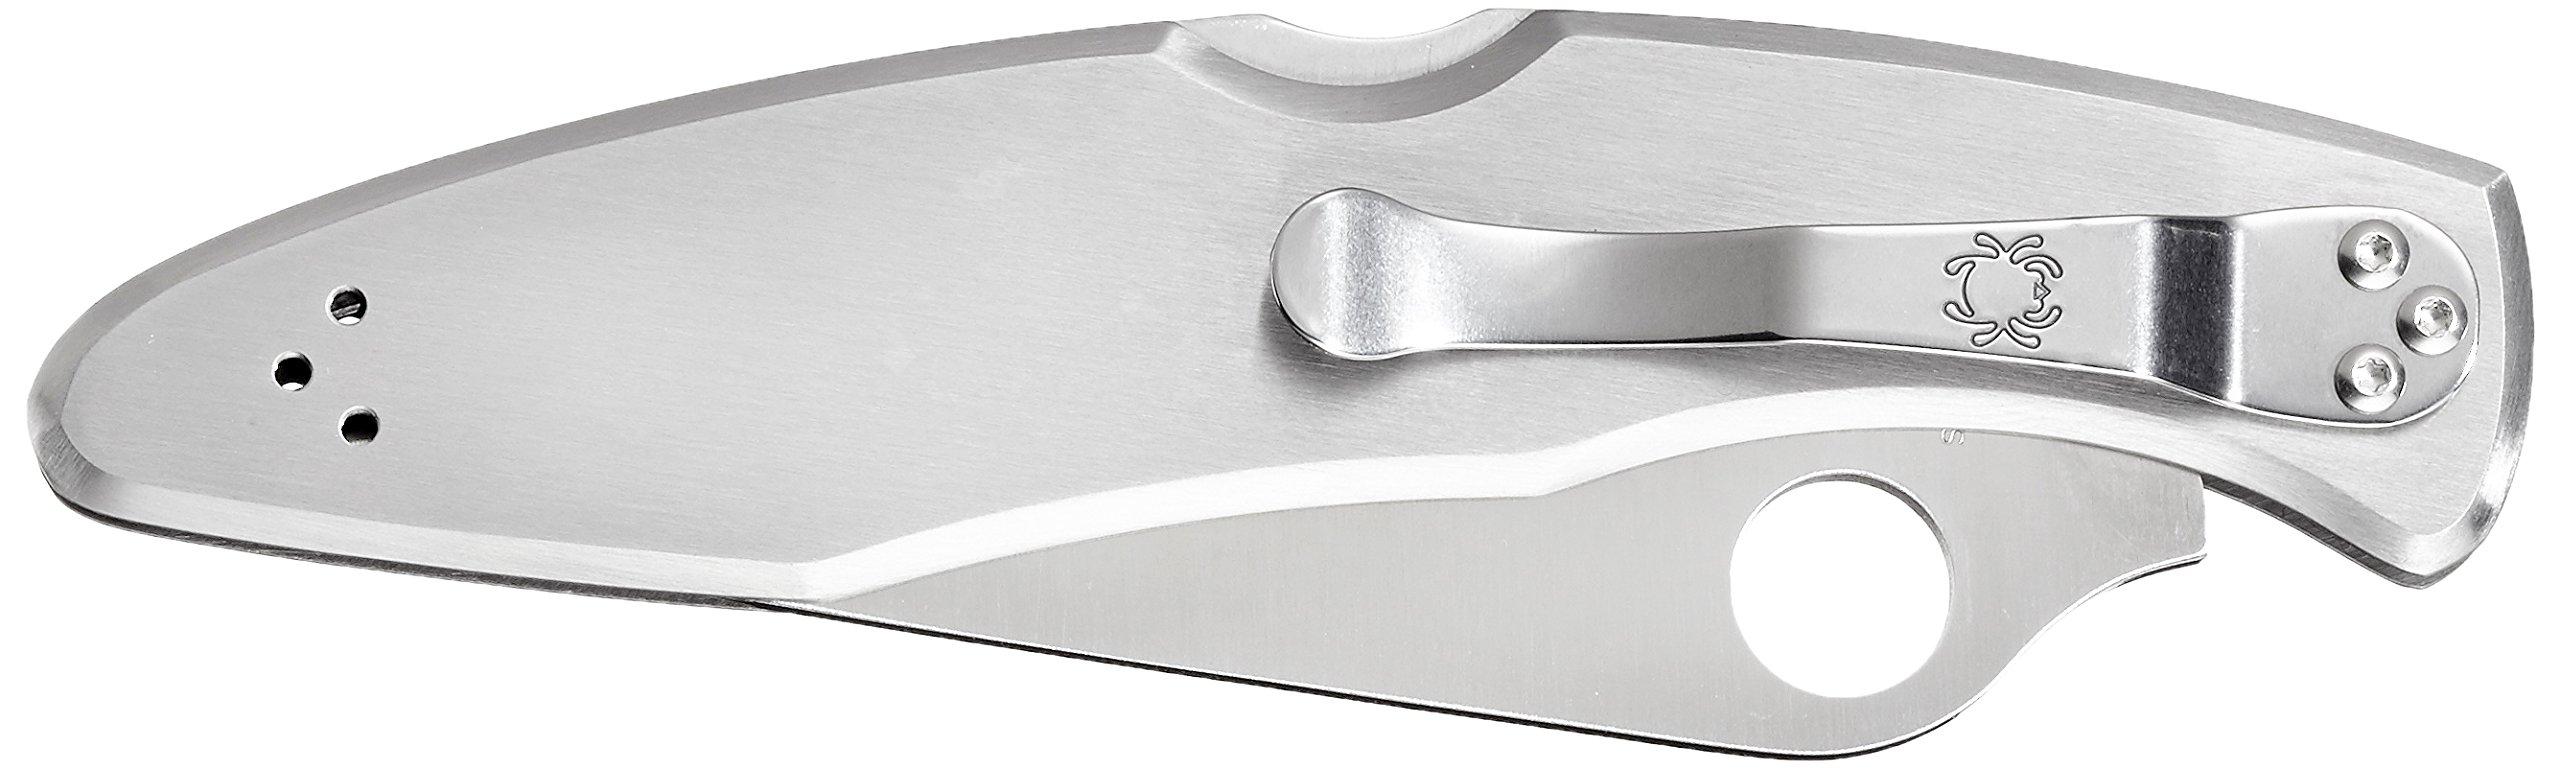 Spyderco Police Model SS PlainEdge Folding Knife C07P